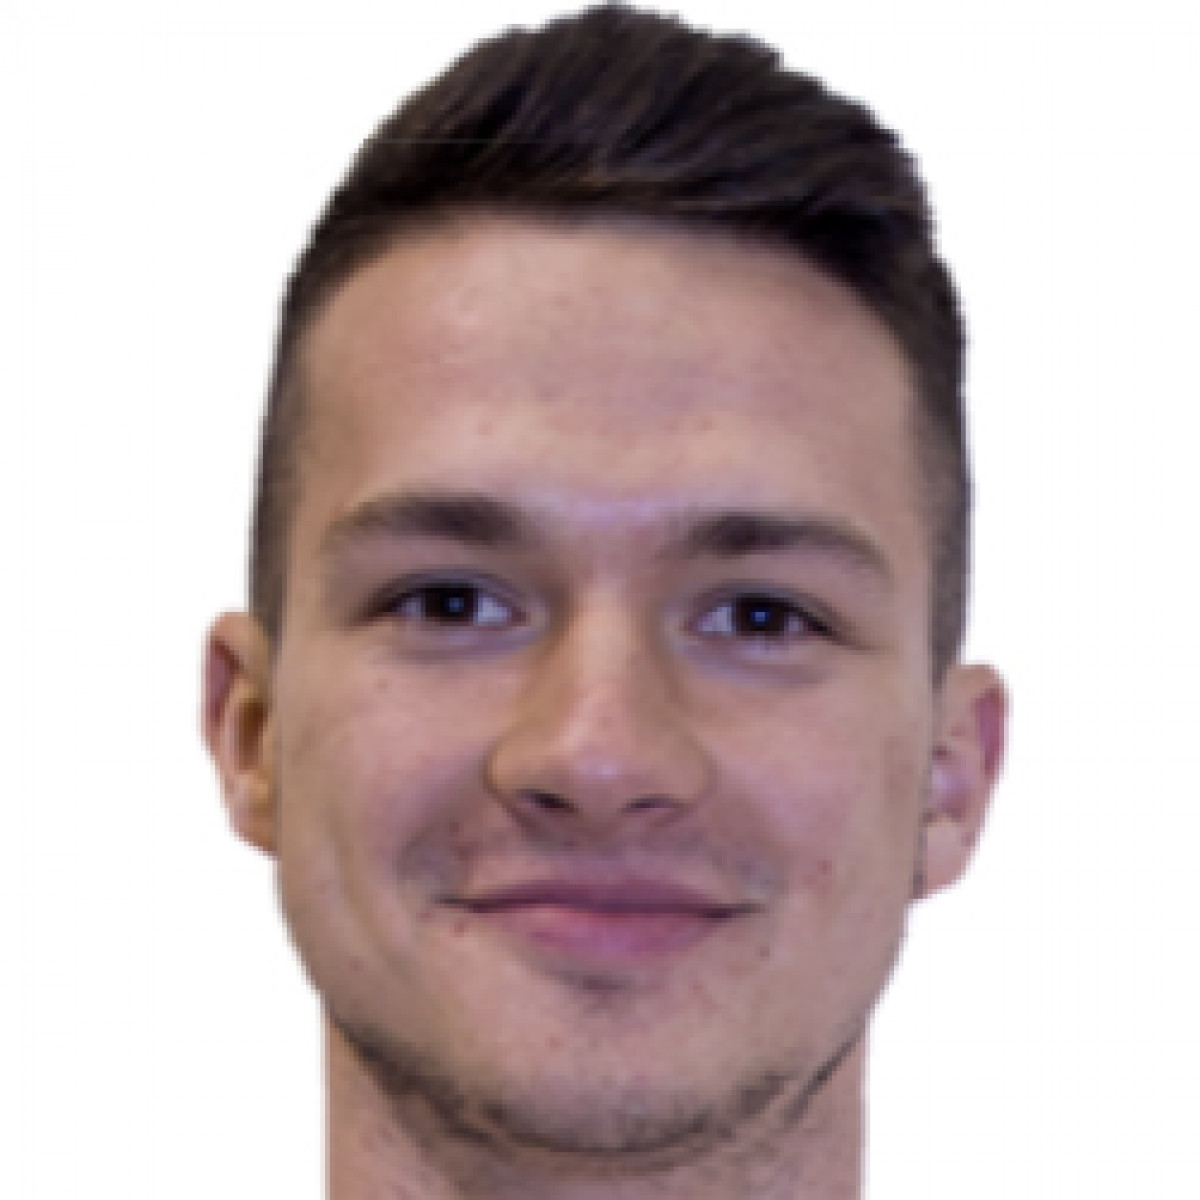 Jakub Fiszer